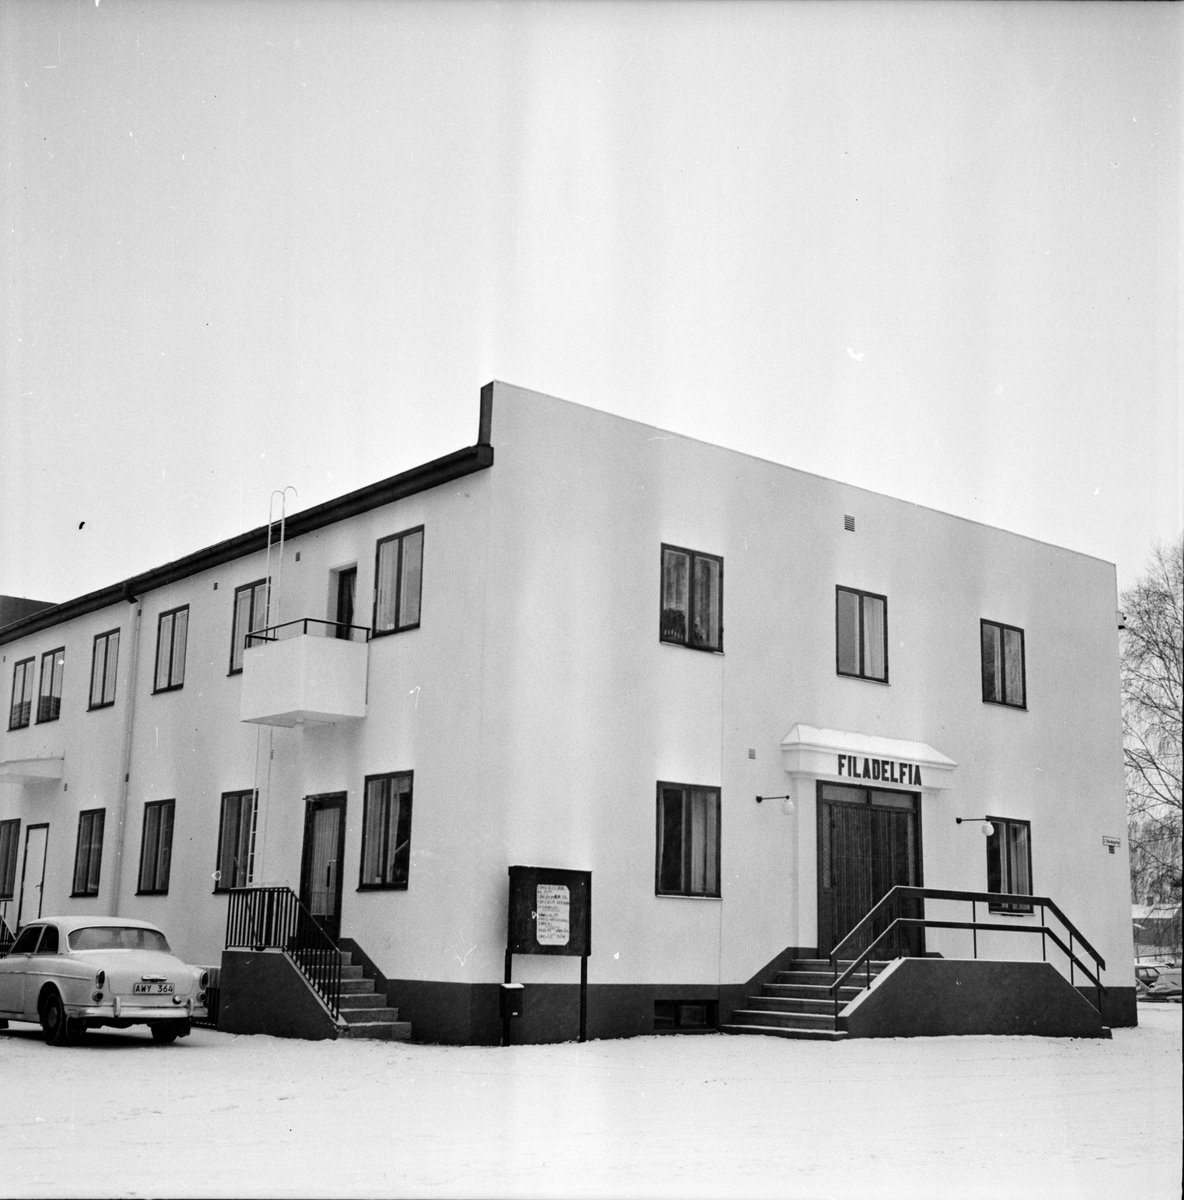 Filadelfia i Arbrå, Makarna Westerlund, Februari 1973